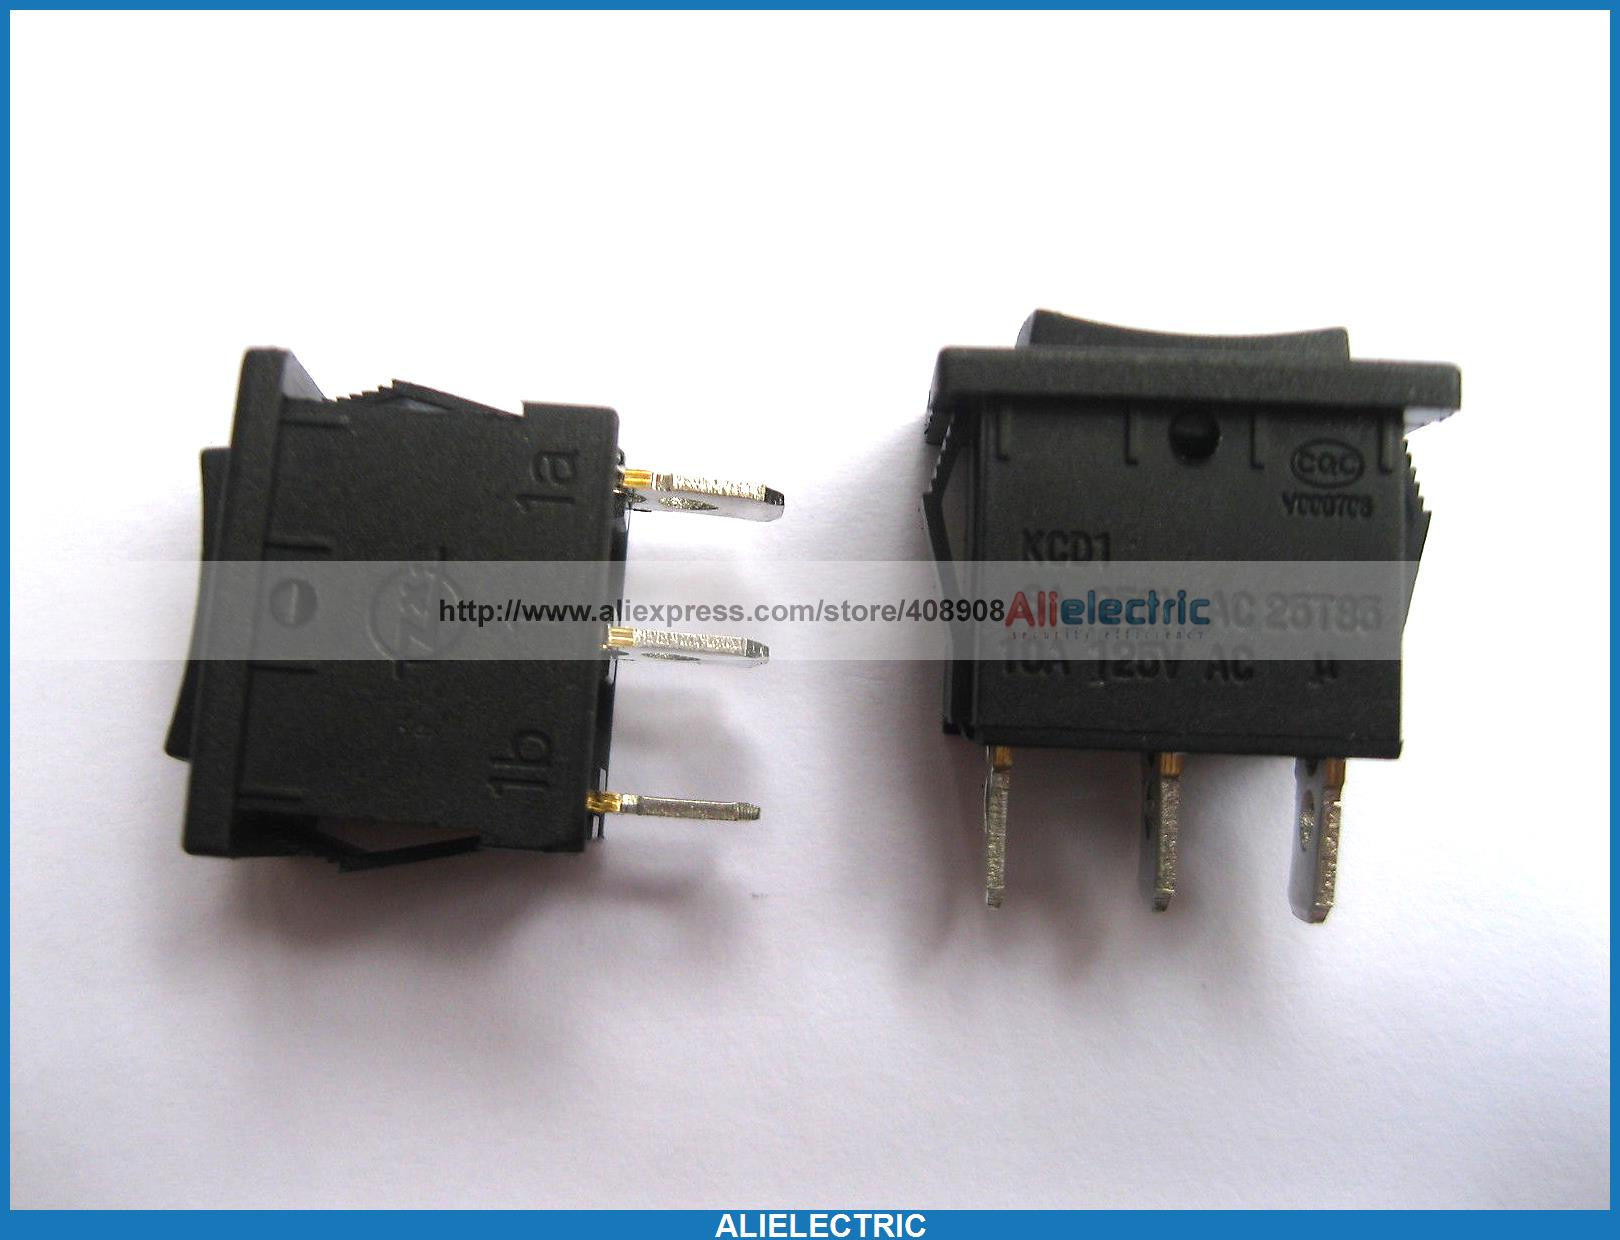 200 Pcs Rocker Switch KCD1 on Off on Black 3pin 6A 10A 20113 diy lamp line on off switch black 2 pcs